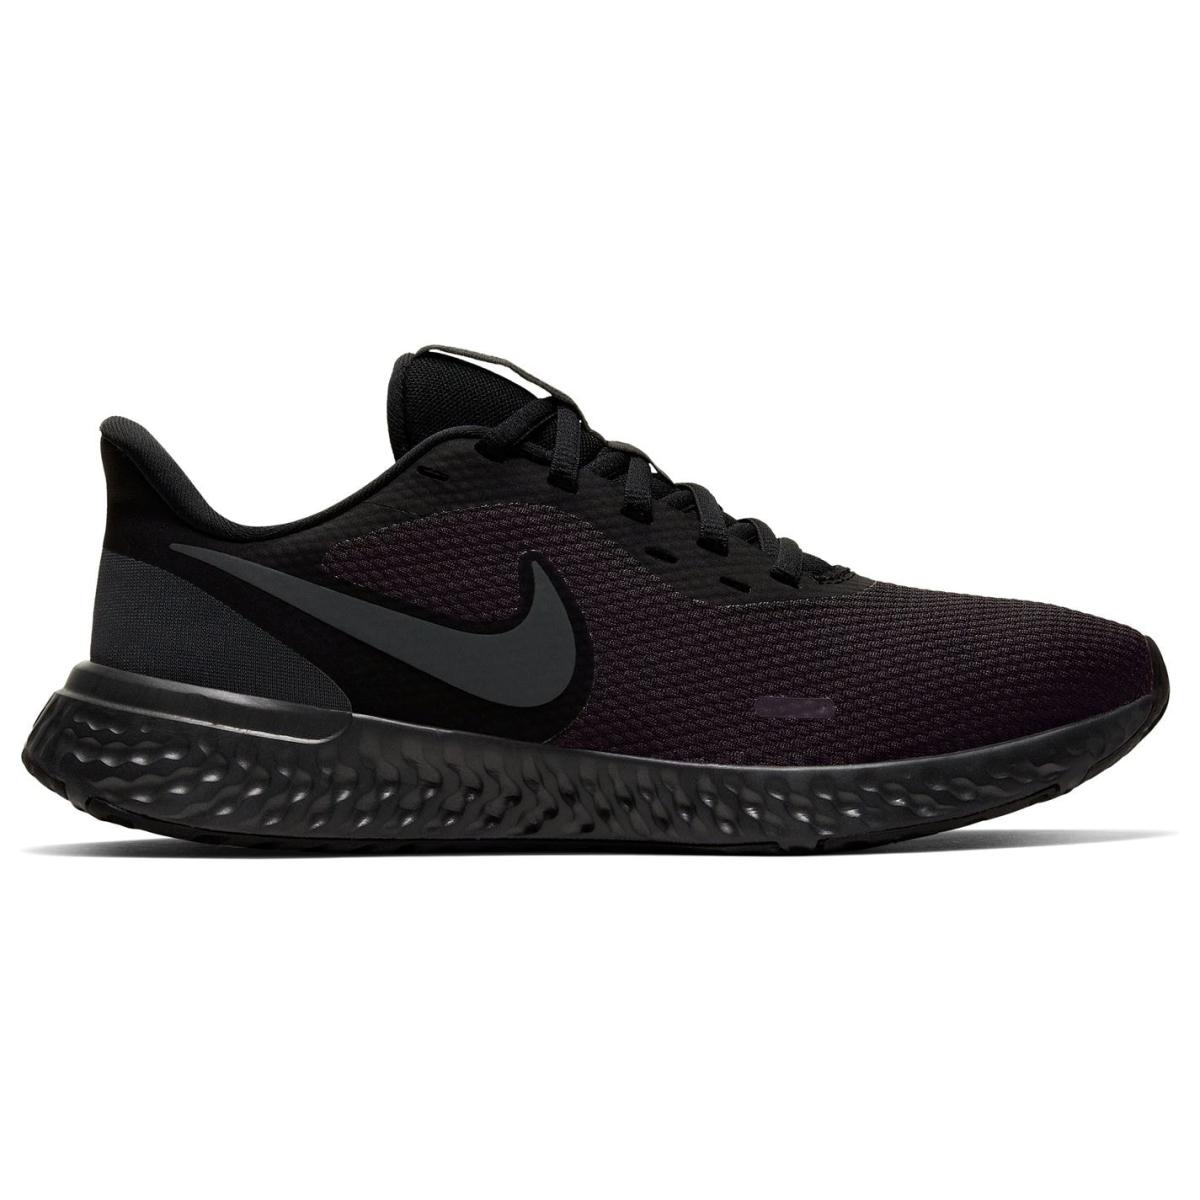 Nike-Revolution-Turnschuhe-Damen-Sneaker-Sportschuhe-Laufschuhe-1160 Indexbild 3